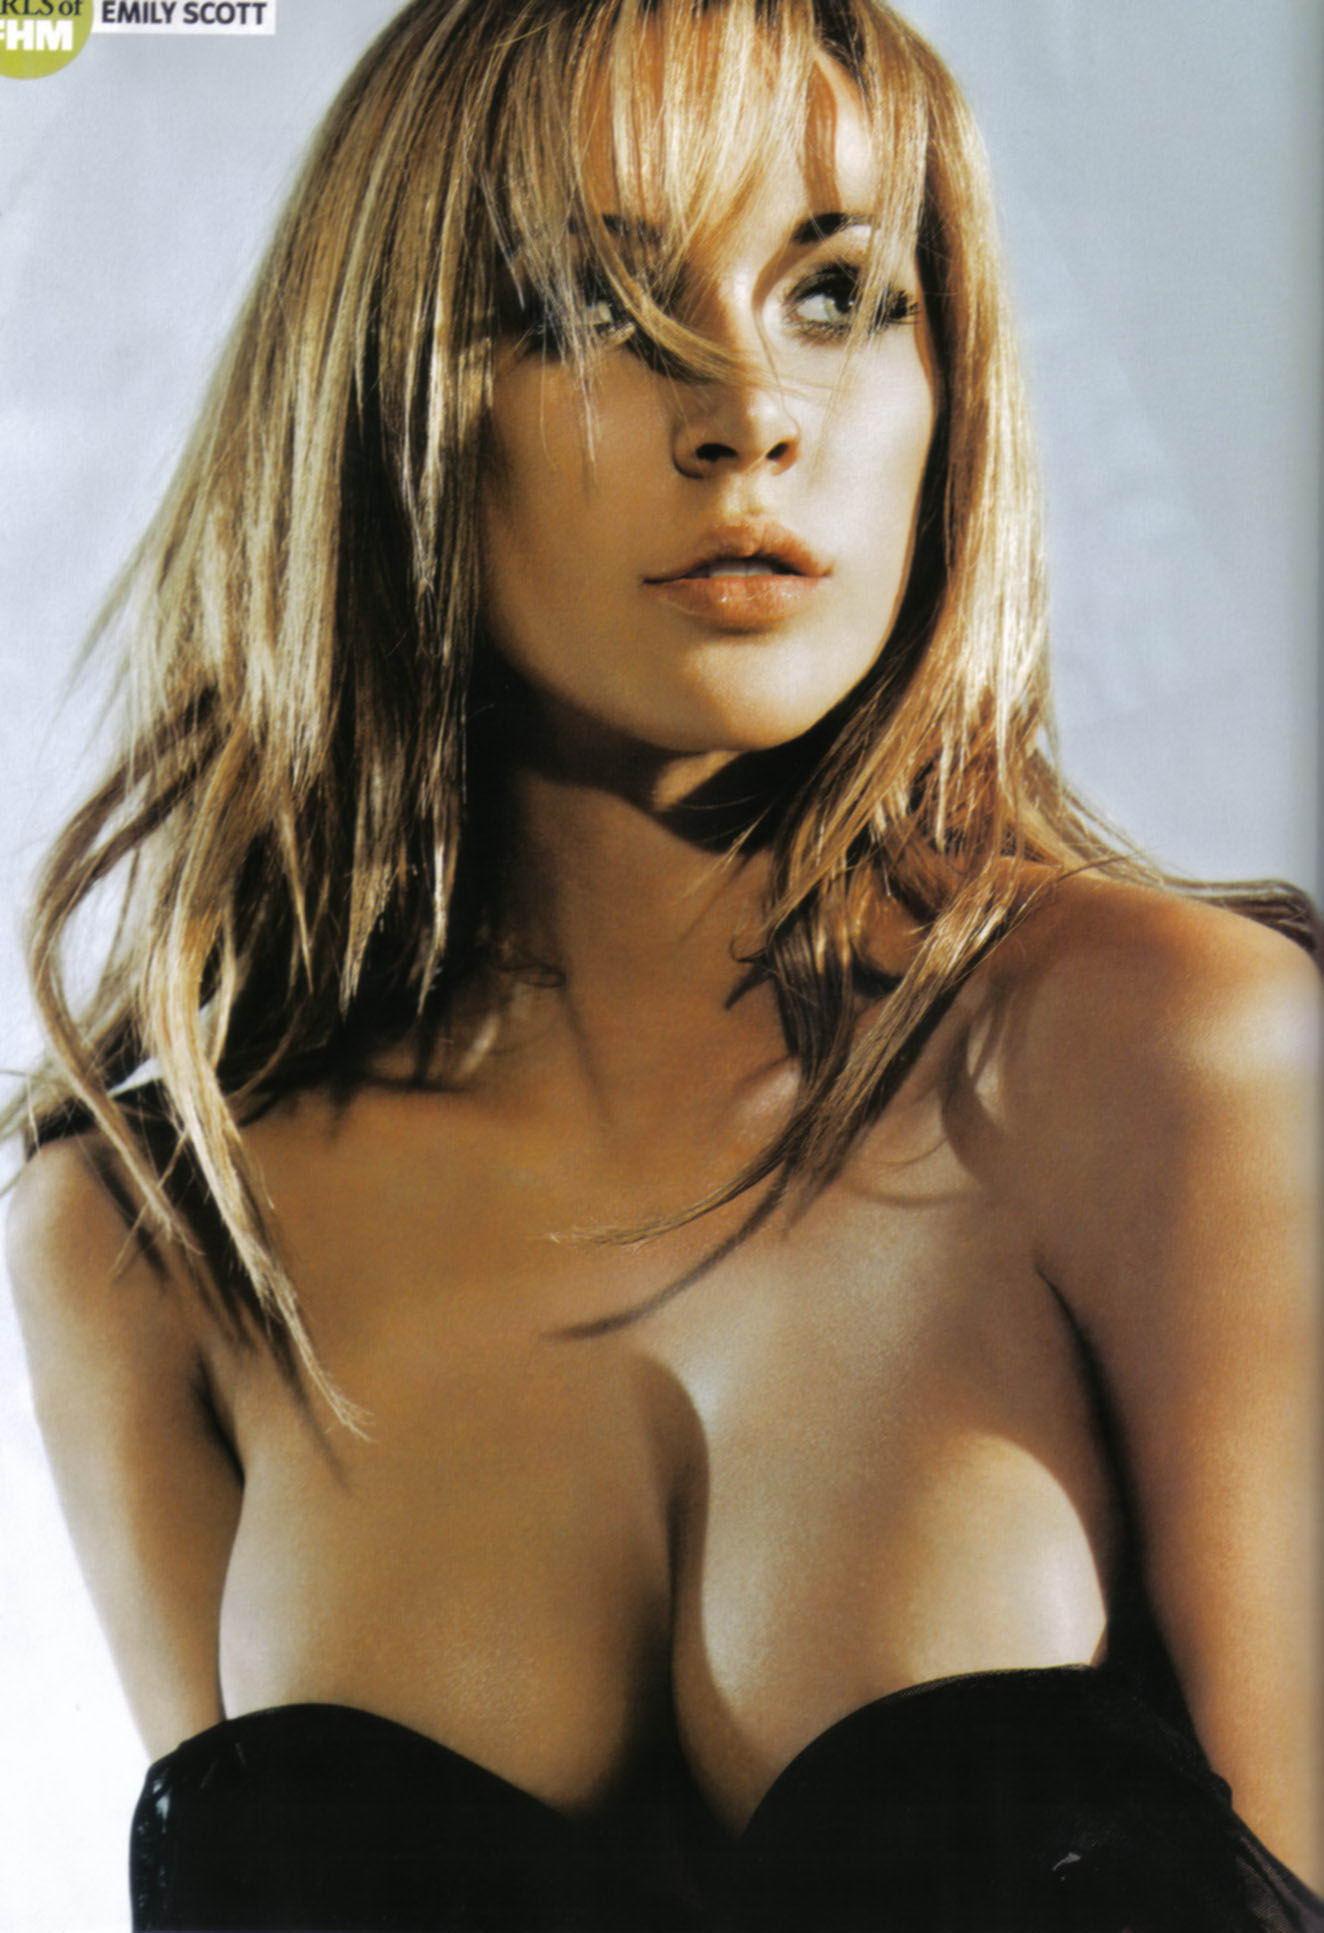 Emily scott nipples